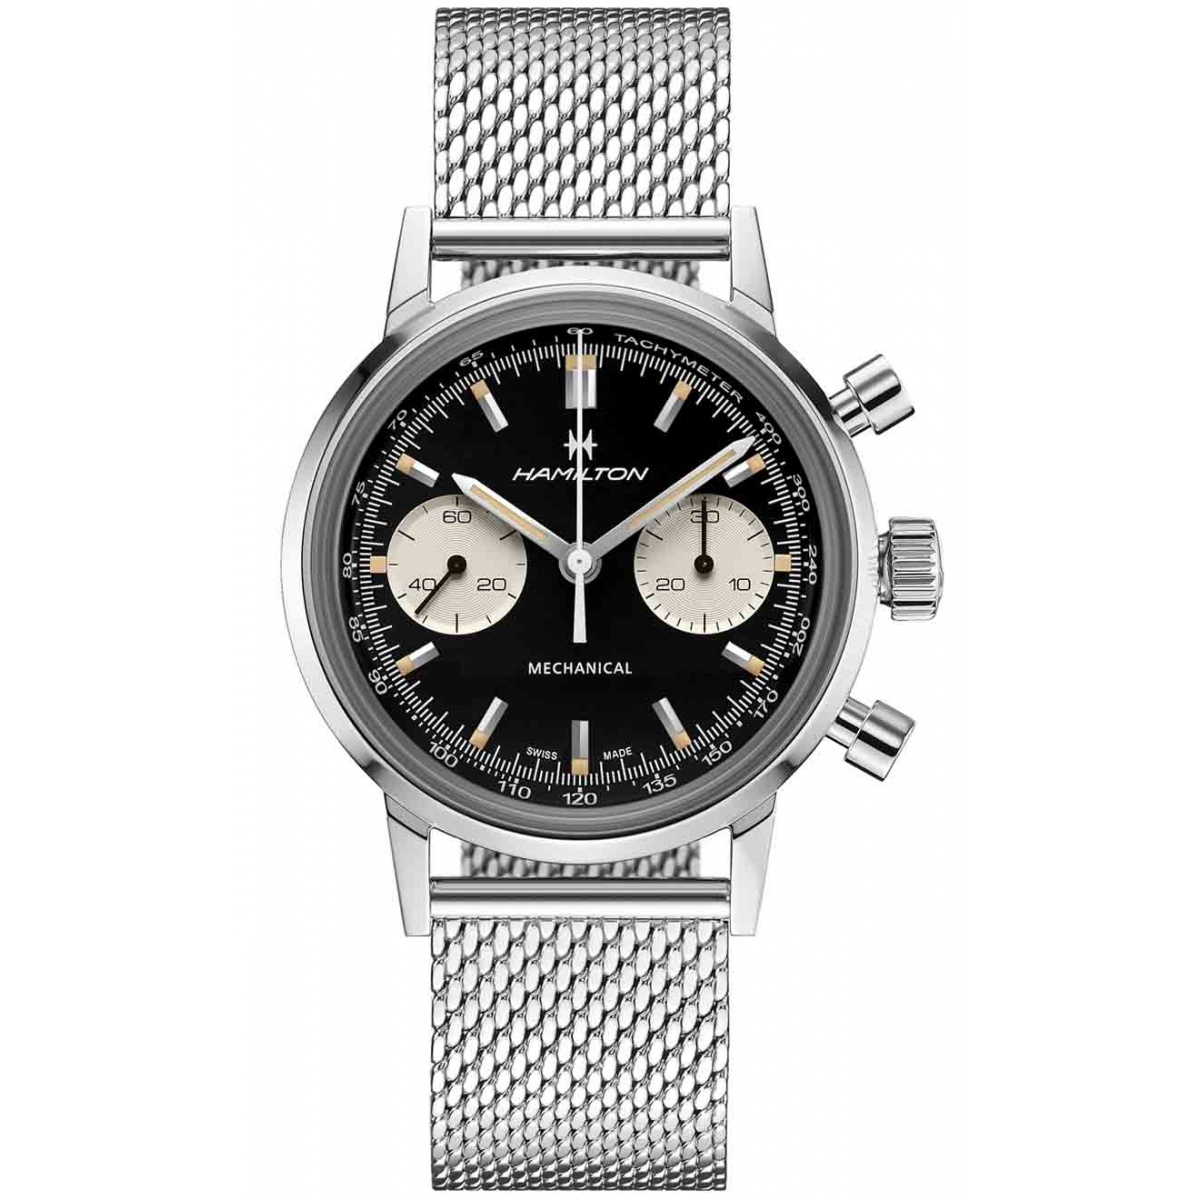 Hamilton American Classic Intra-Matic Chronograph H Mecánico 100 M - ∅40 mm, Esfera negra, acero